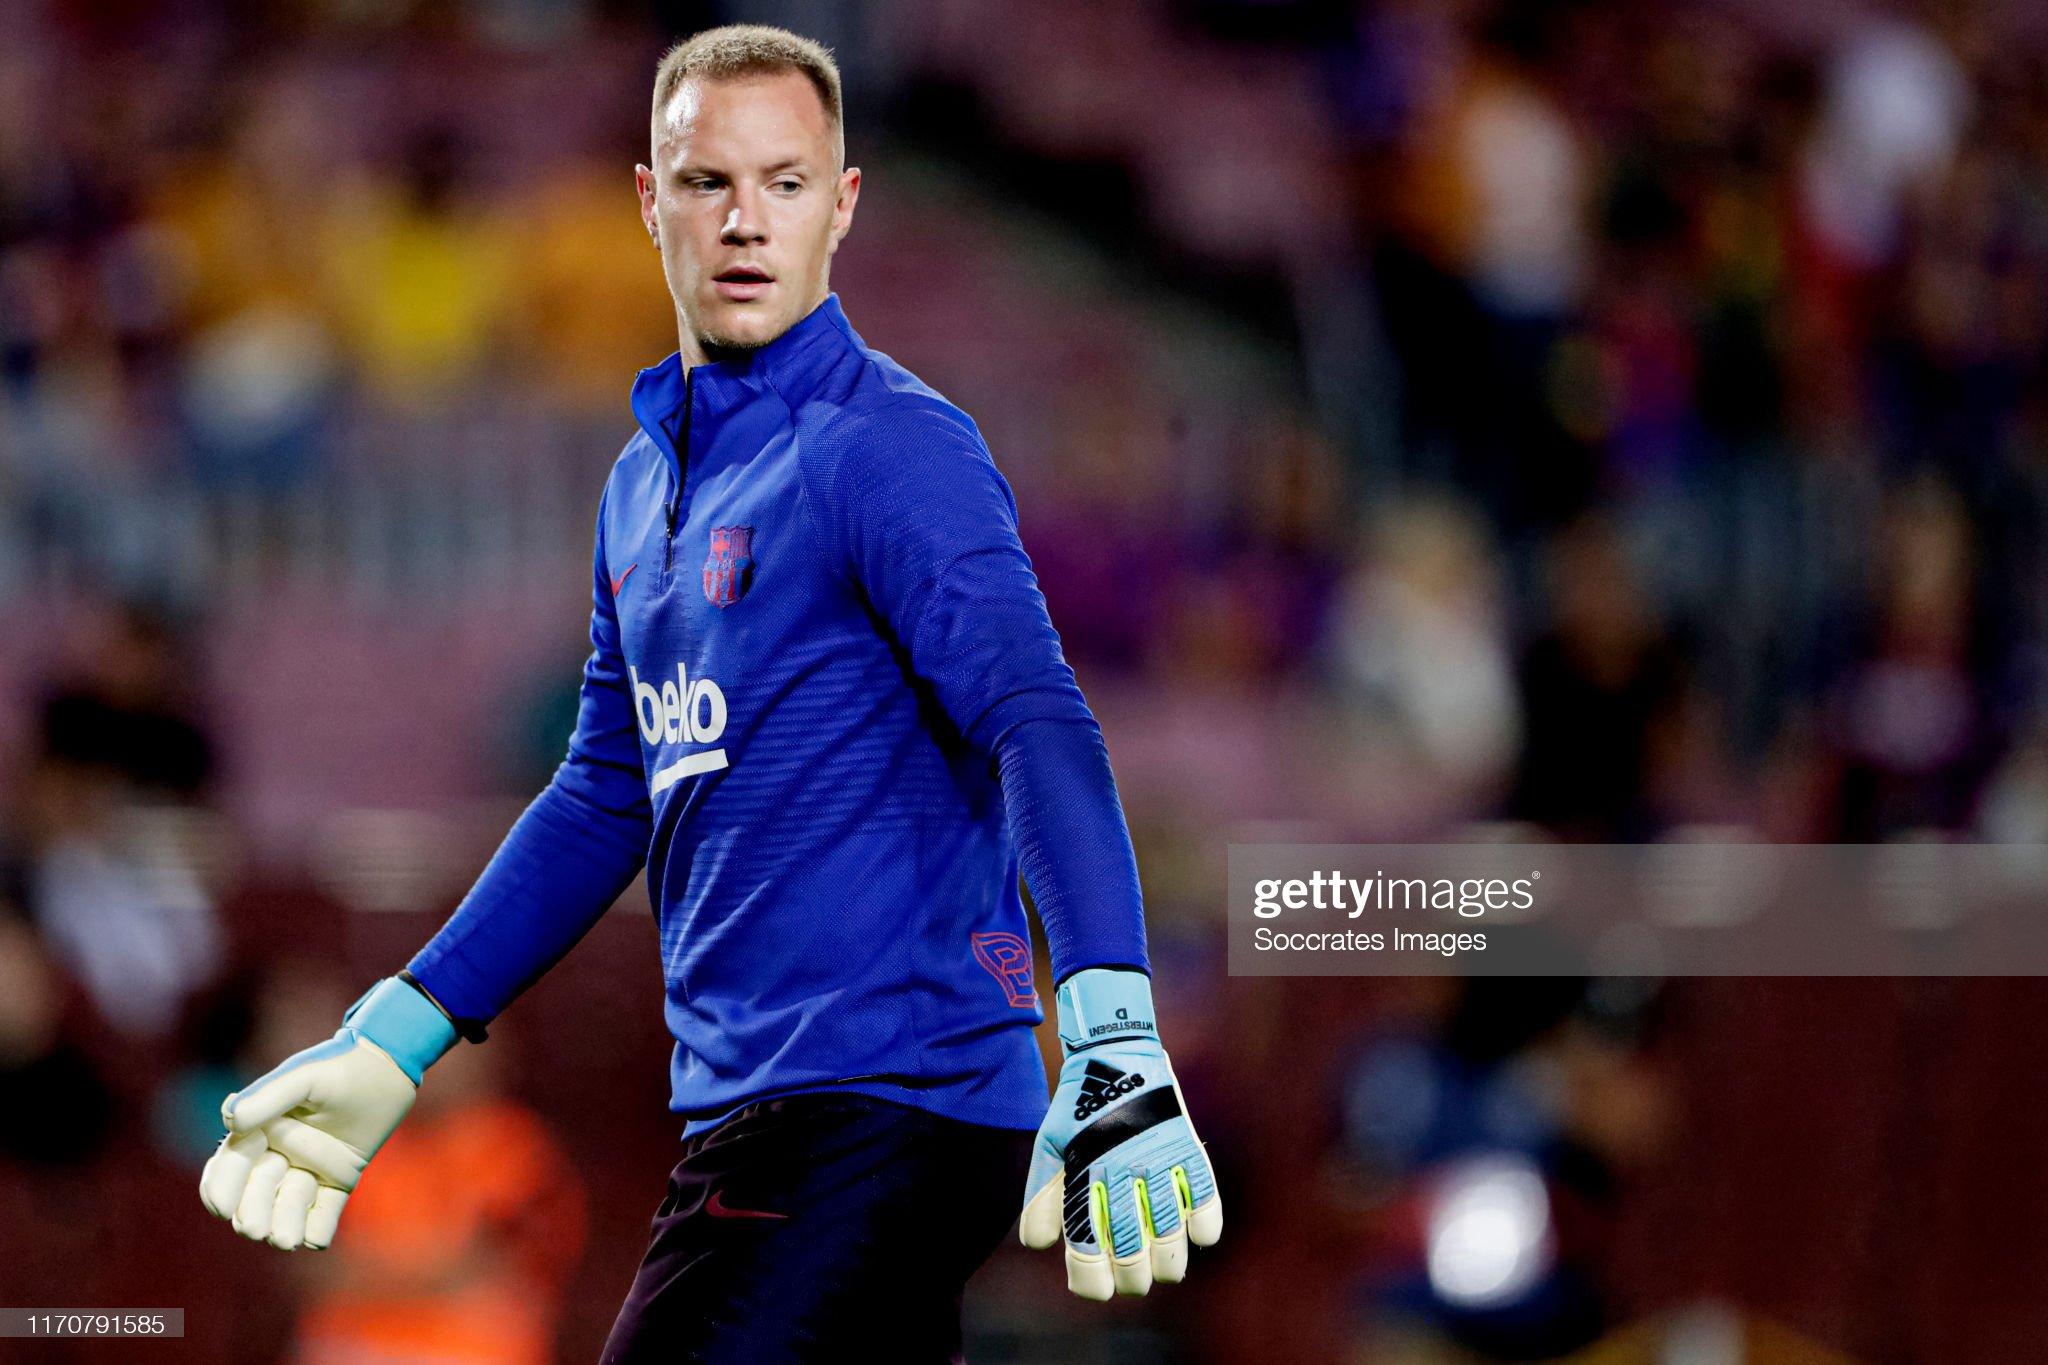 صور مباراة : برشلونة - فياريال 2-1 ( 24-09-2019 )  Marc-andre-ter-stegen-of-fc-barcelona-during-the-la-liga-santander-picture-id1170791585?s=2048x2048